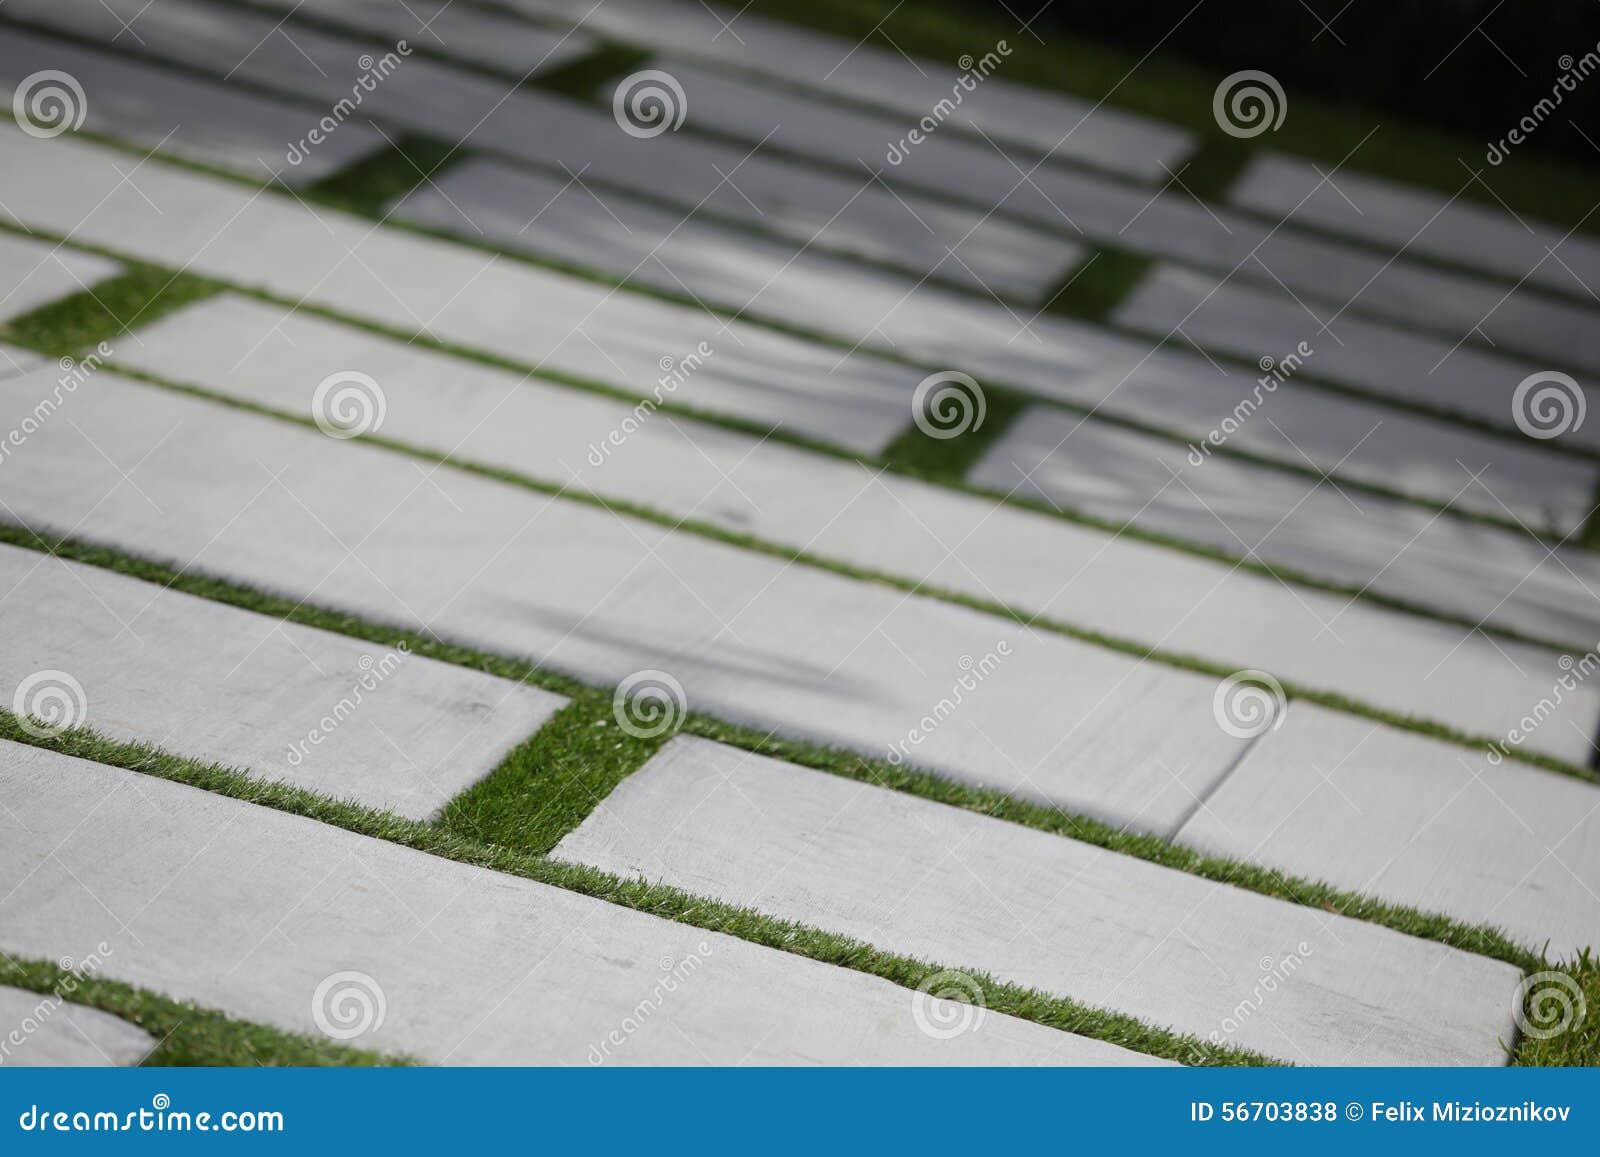 Concrete Block Driveway Stock Photo Image 56703838